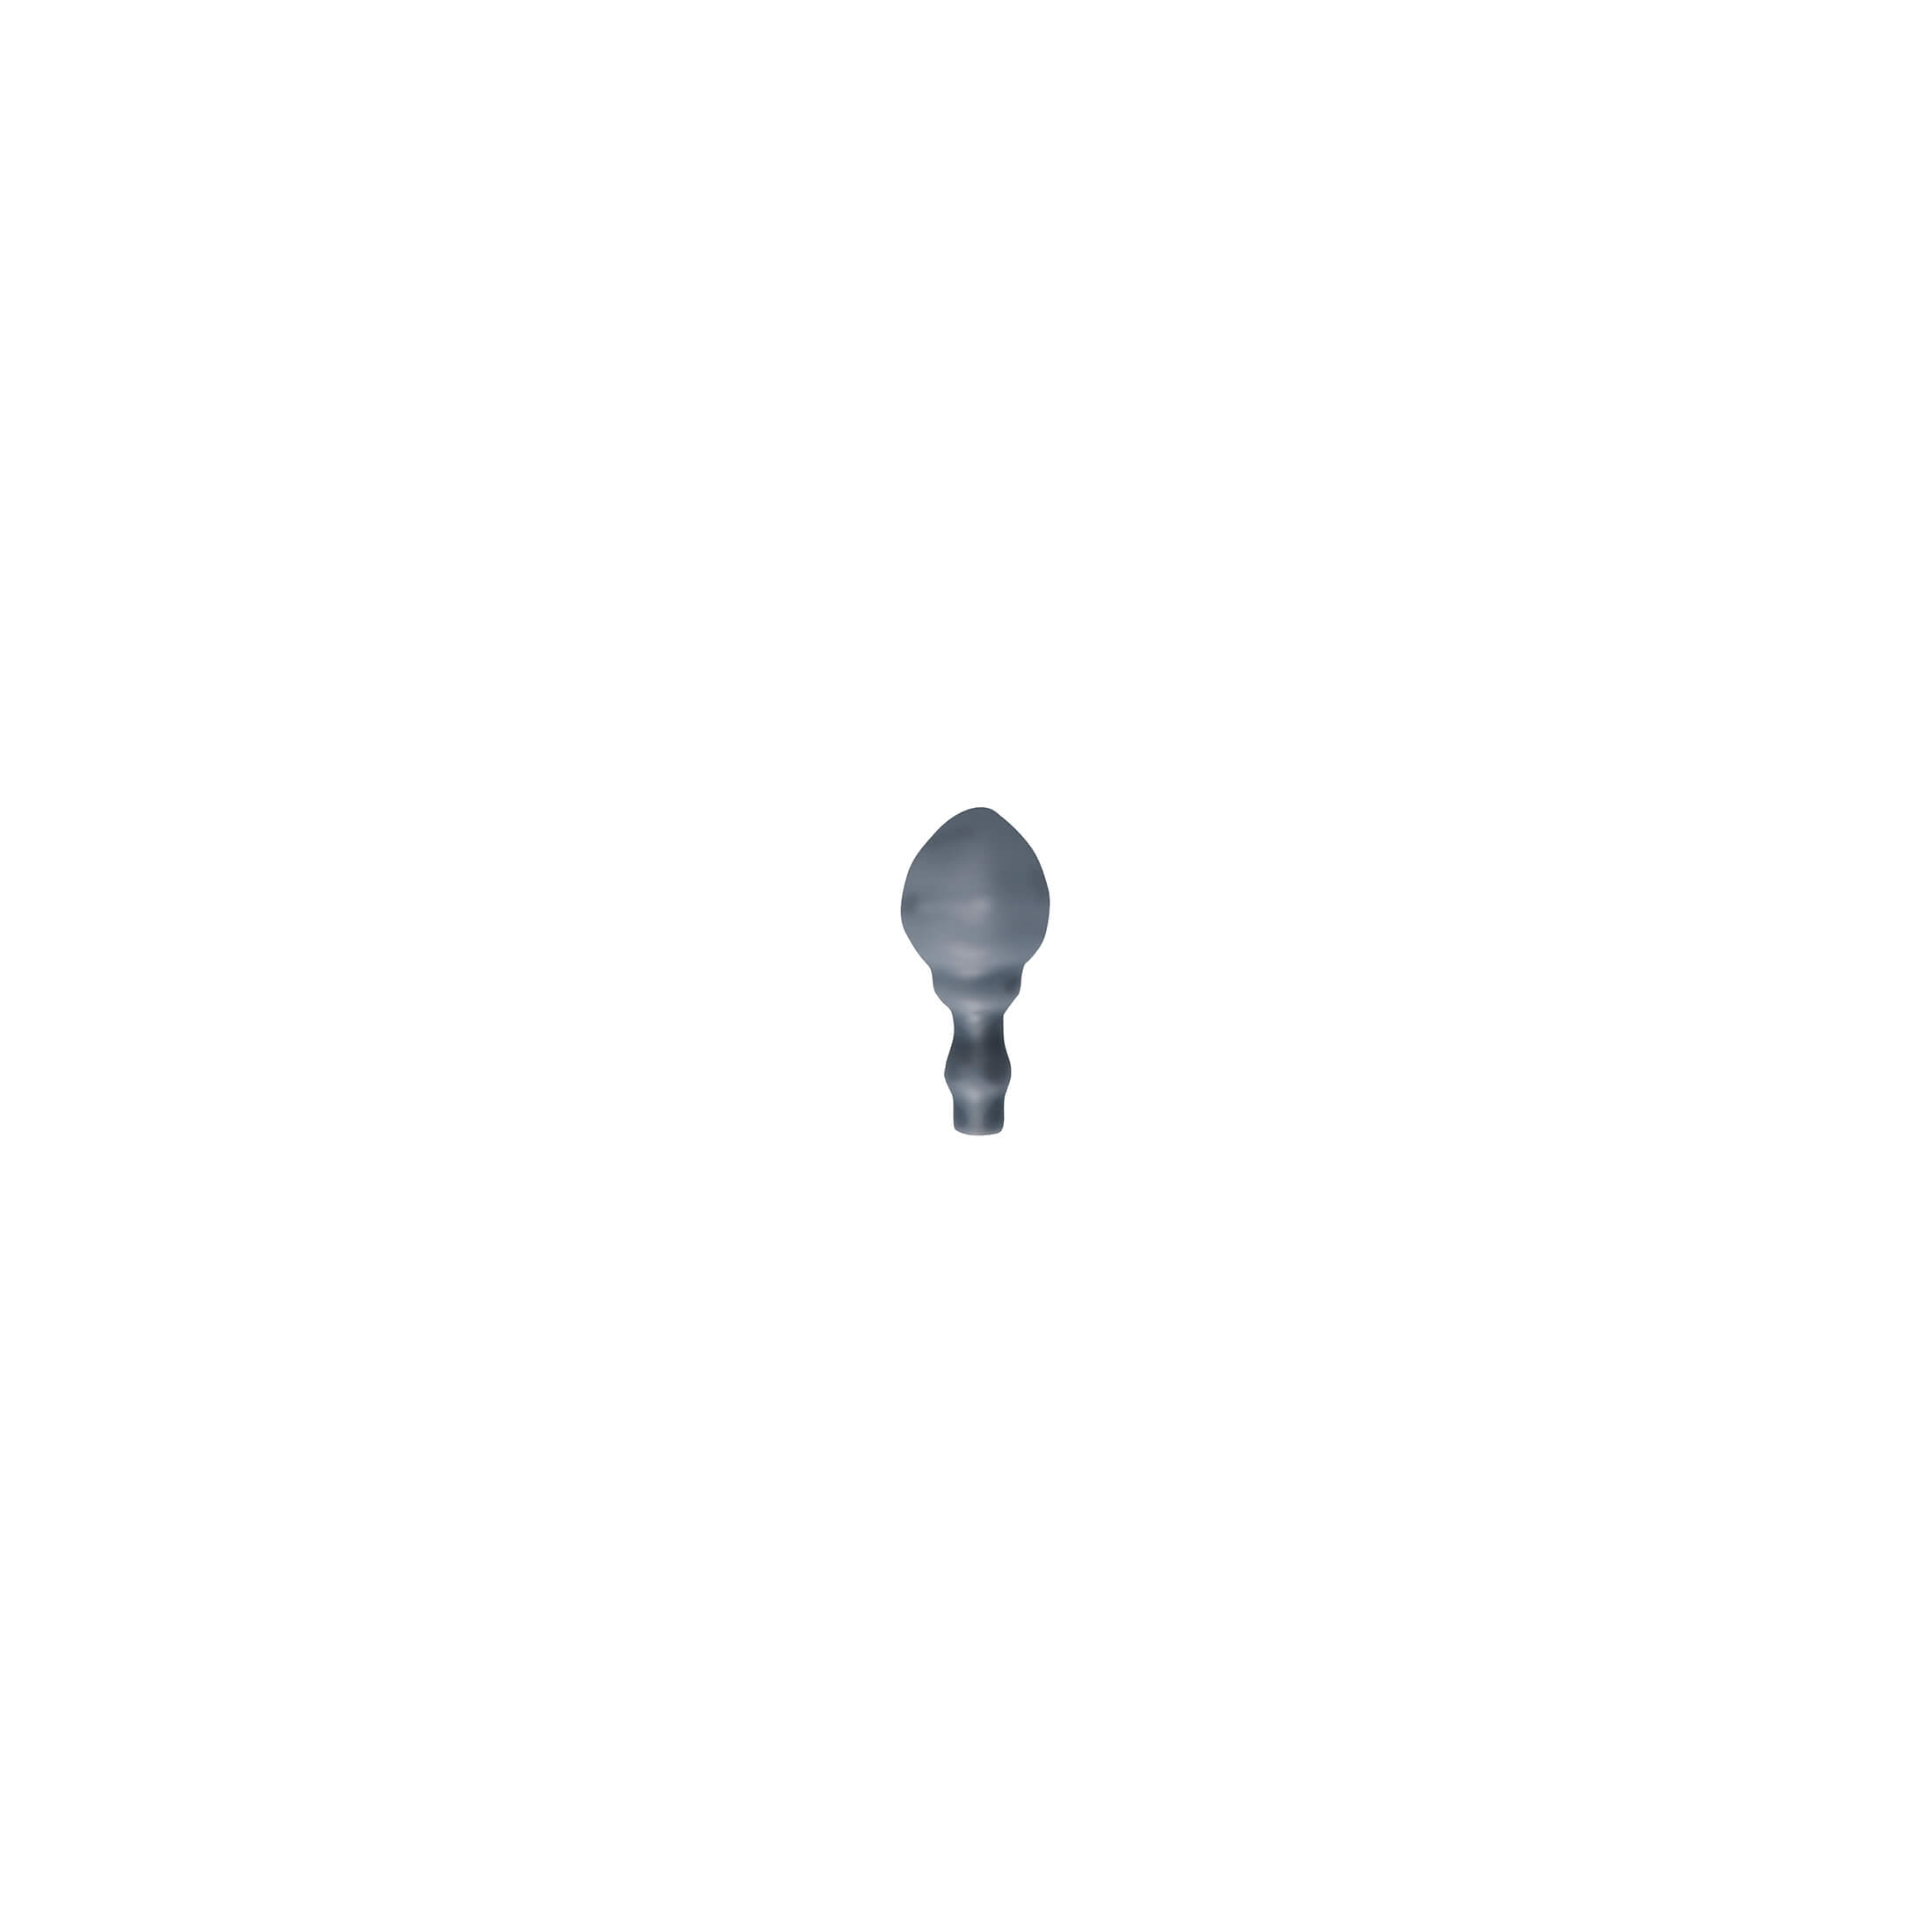 ADNE5602 - ANGULO EXTERIOR MOLDURAITALIANA PB - 5 cm X 2.3 cm